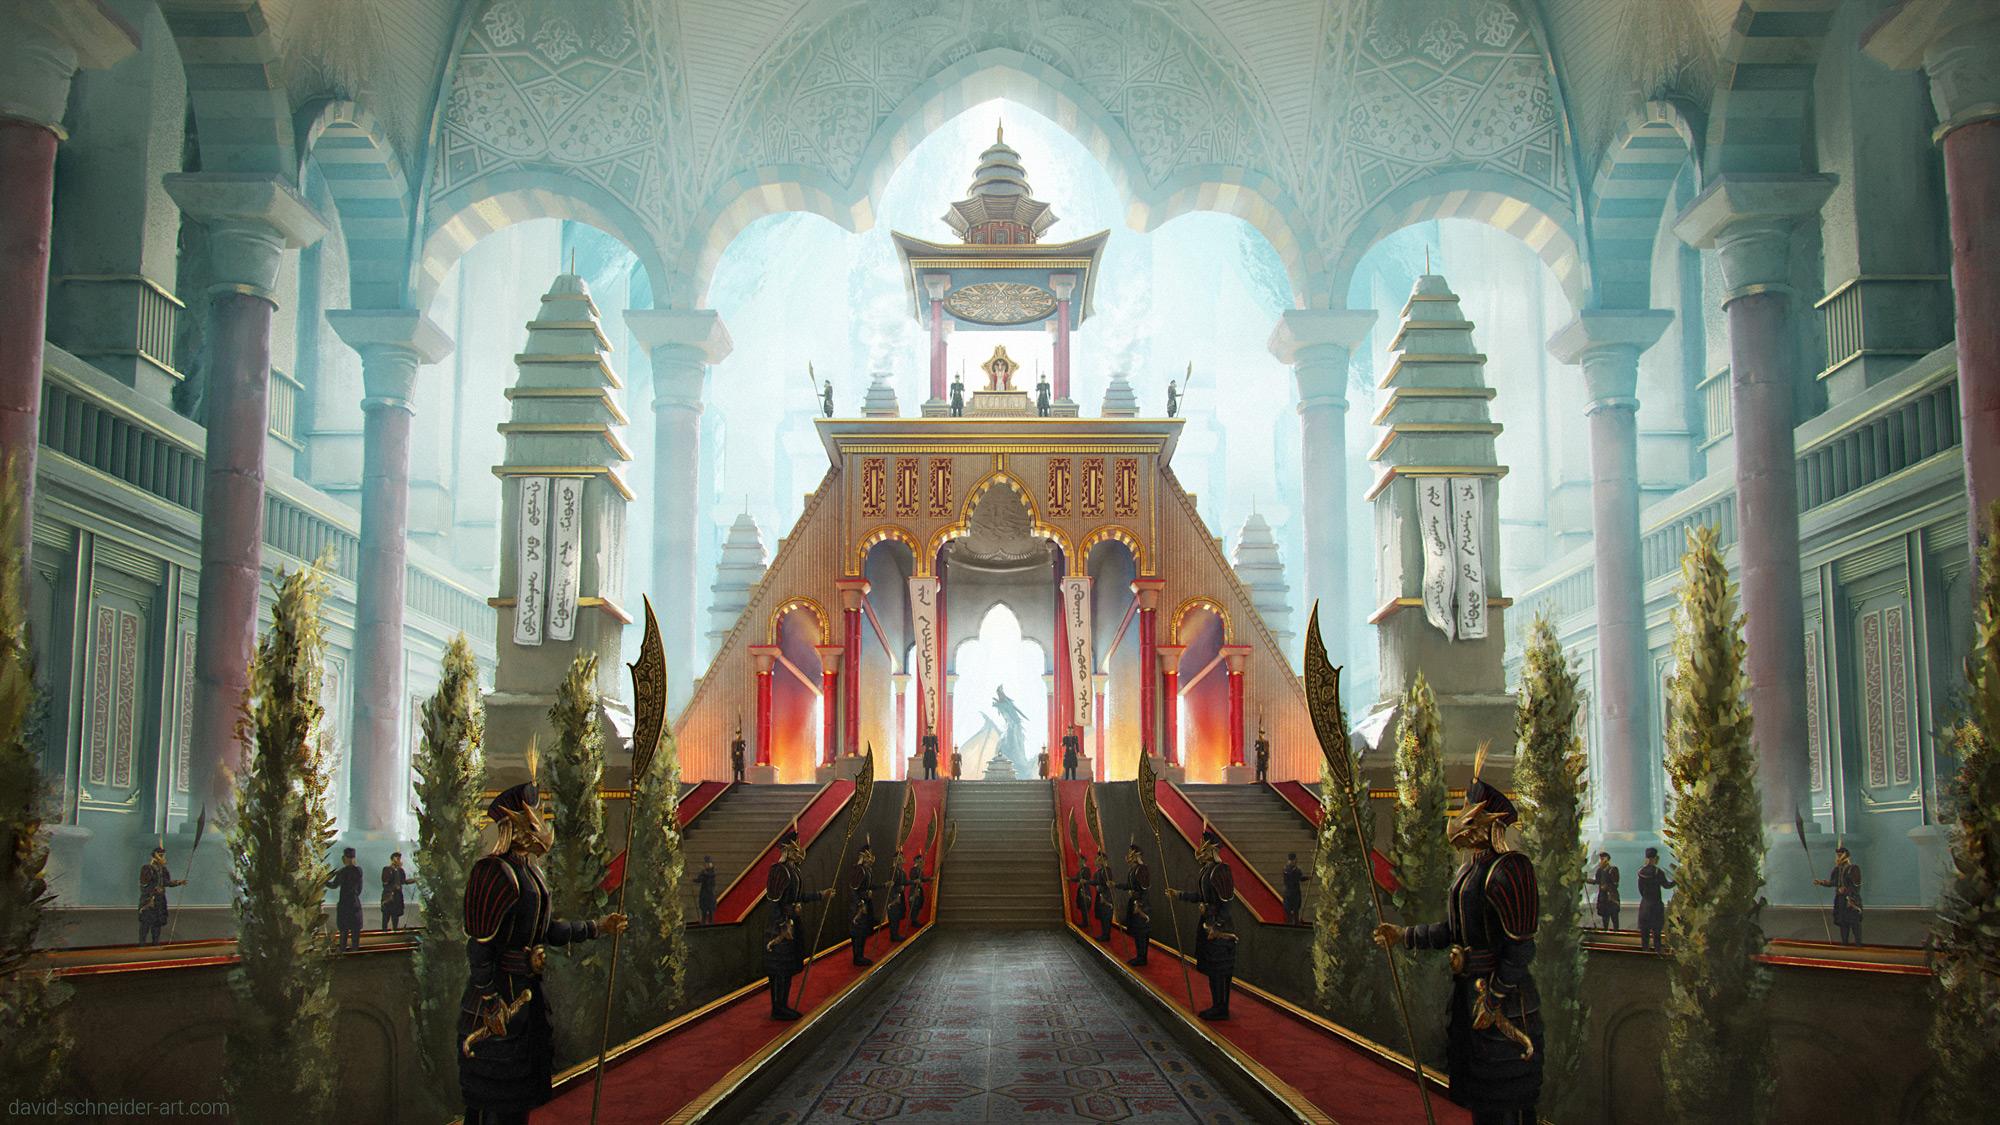 Mongolian architecture, fantasy, dragon, emperor, empress, throne room, concept art, illustration, David Schneider